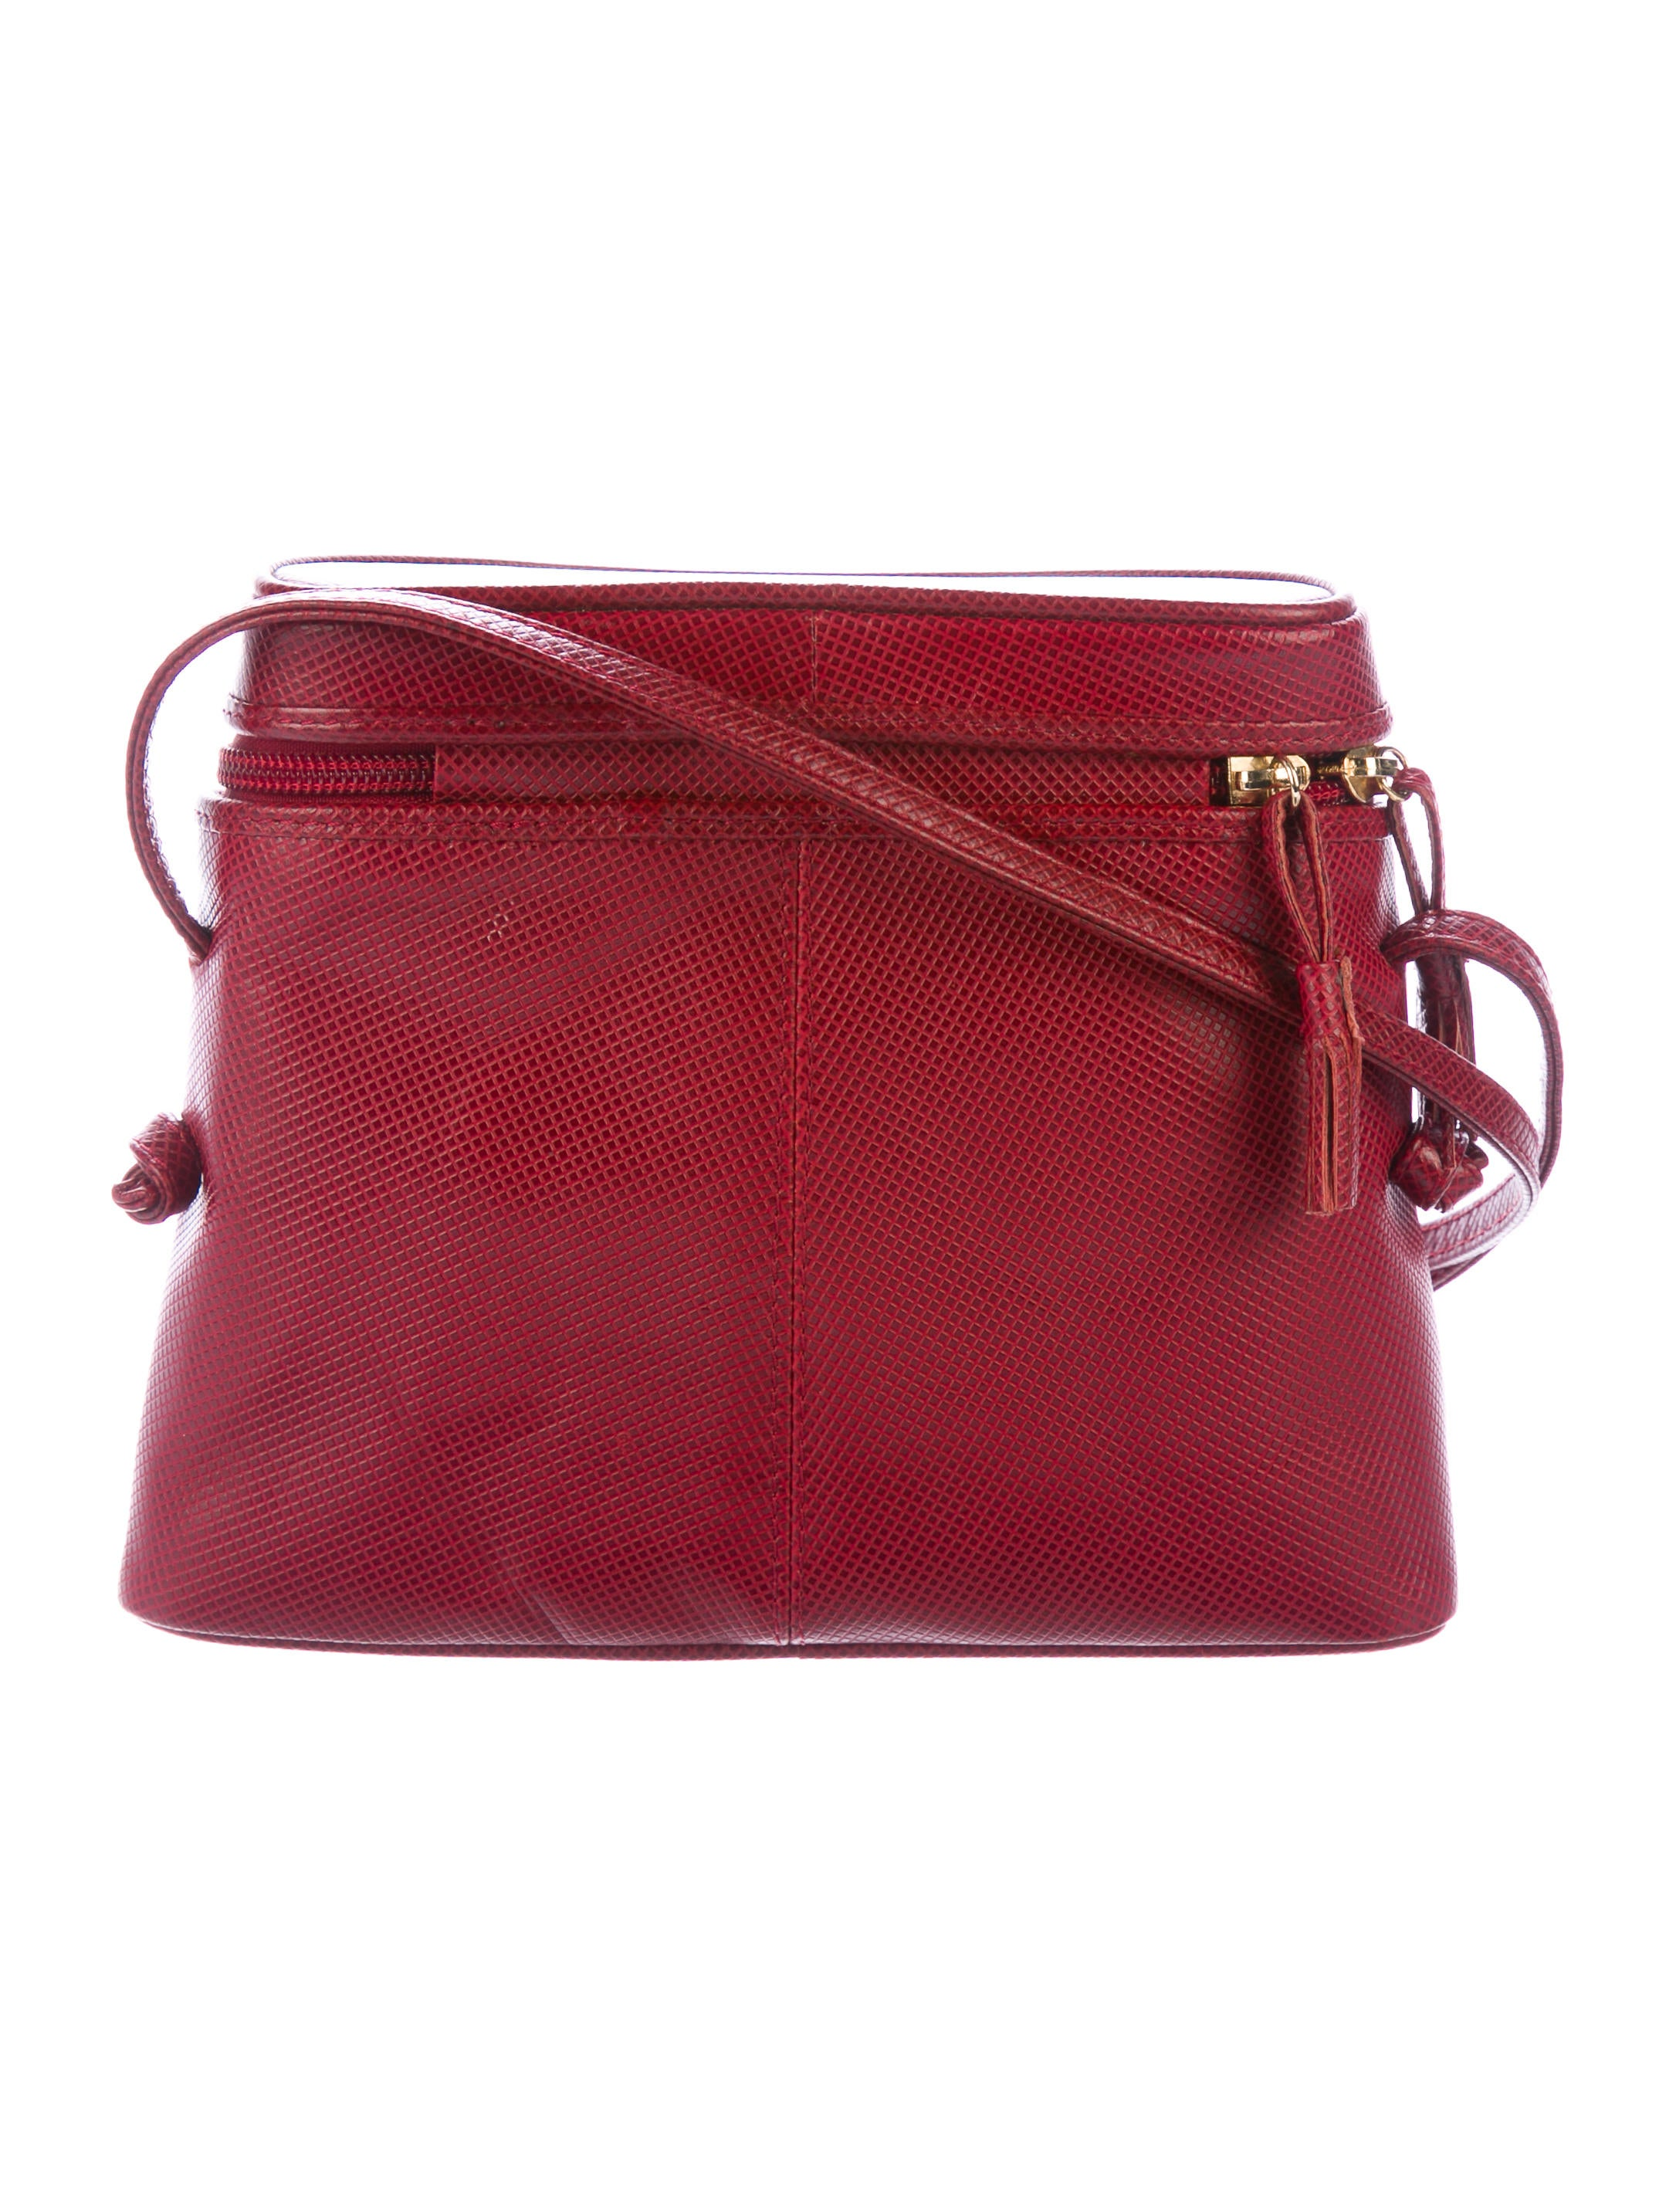 pre owned at therealreal bottega veneta marco polo crossbody bag ... c8afd4c4384dc